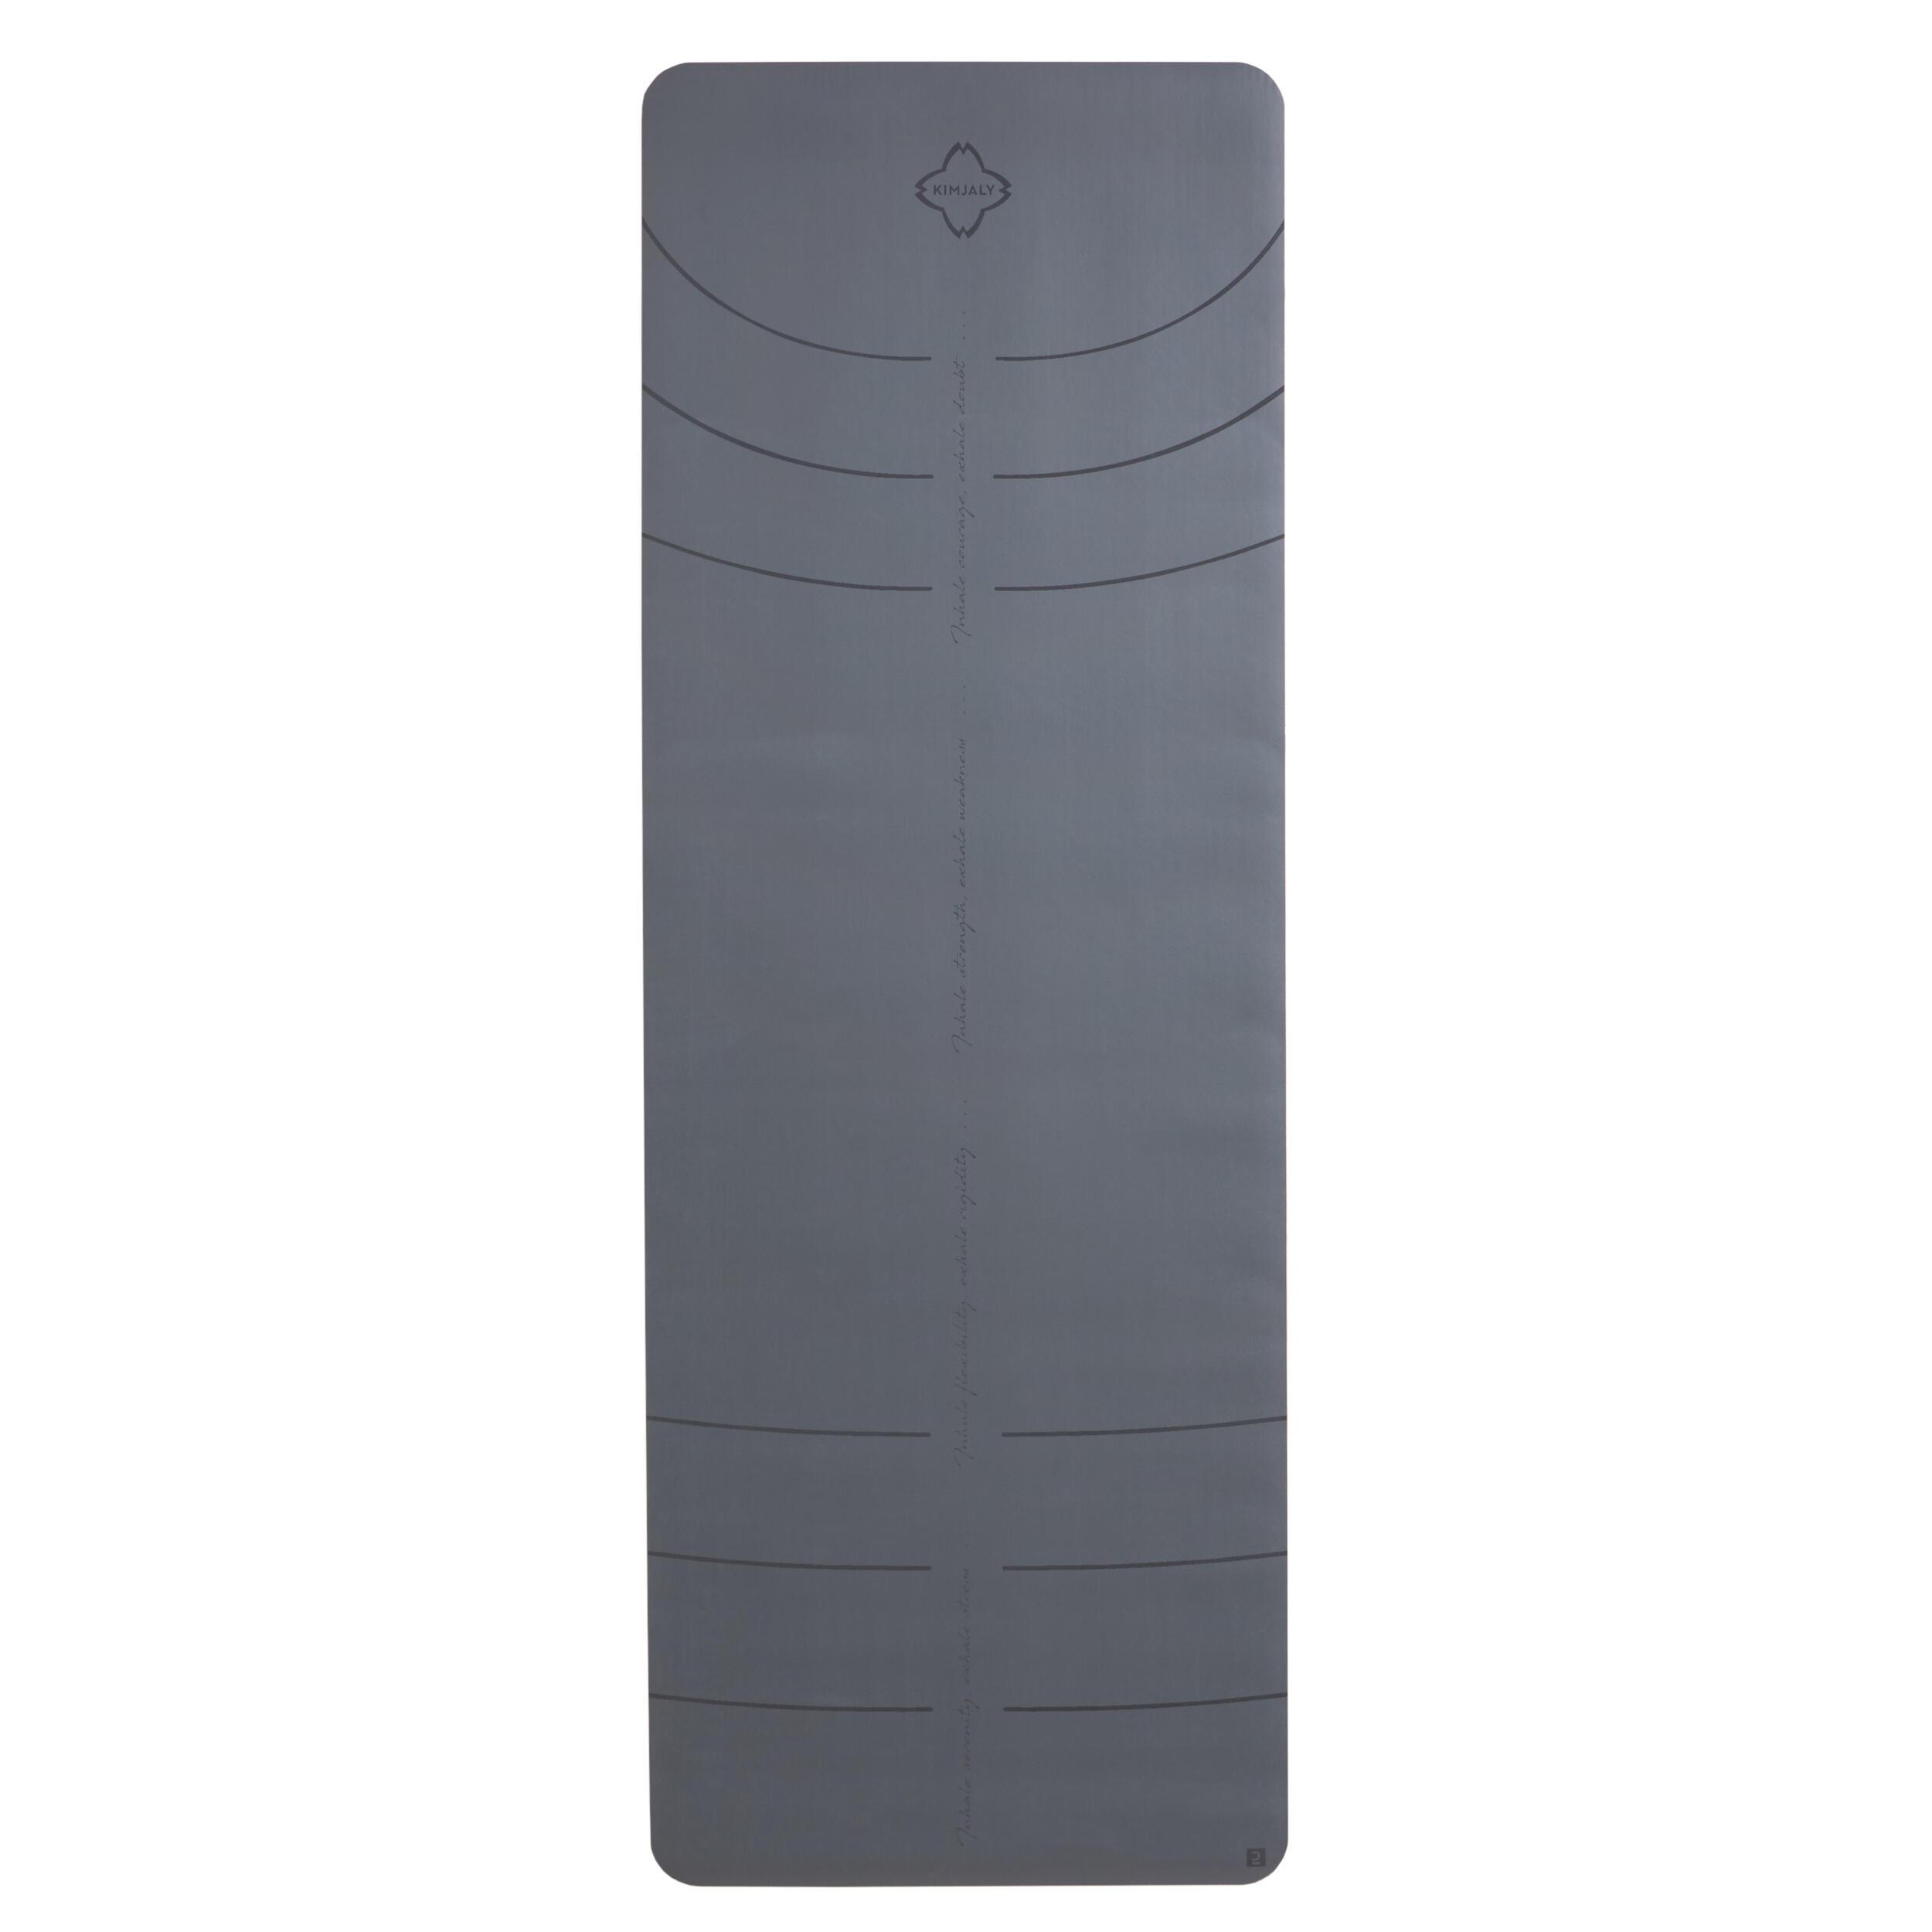 kimjaly tappetino yoga grip+ 5mm grigio 185x65 cm